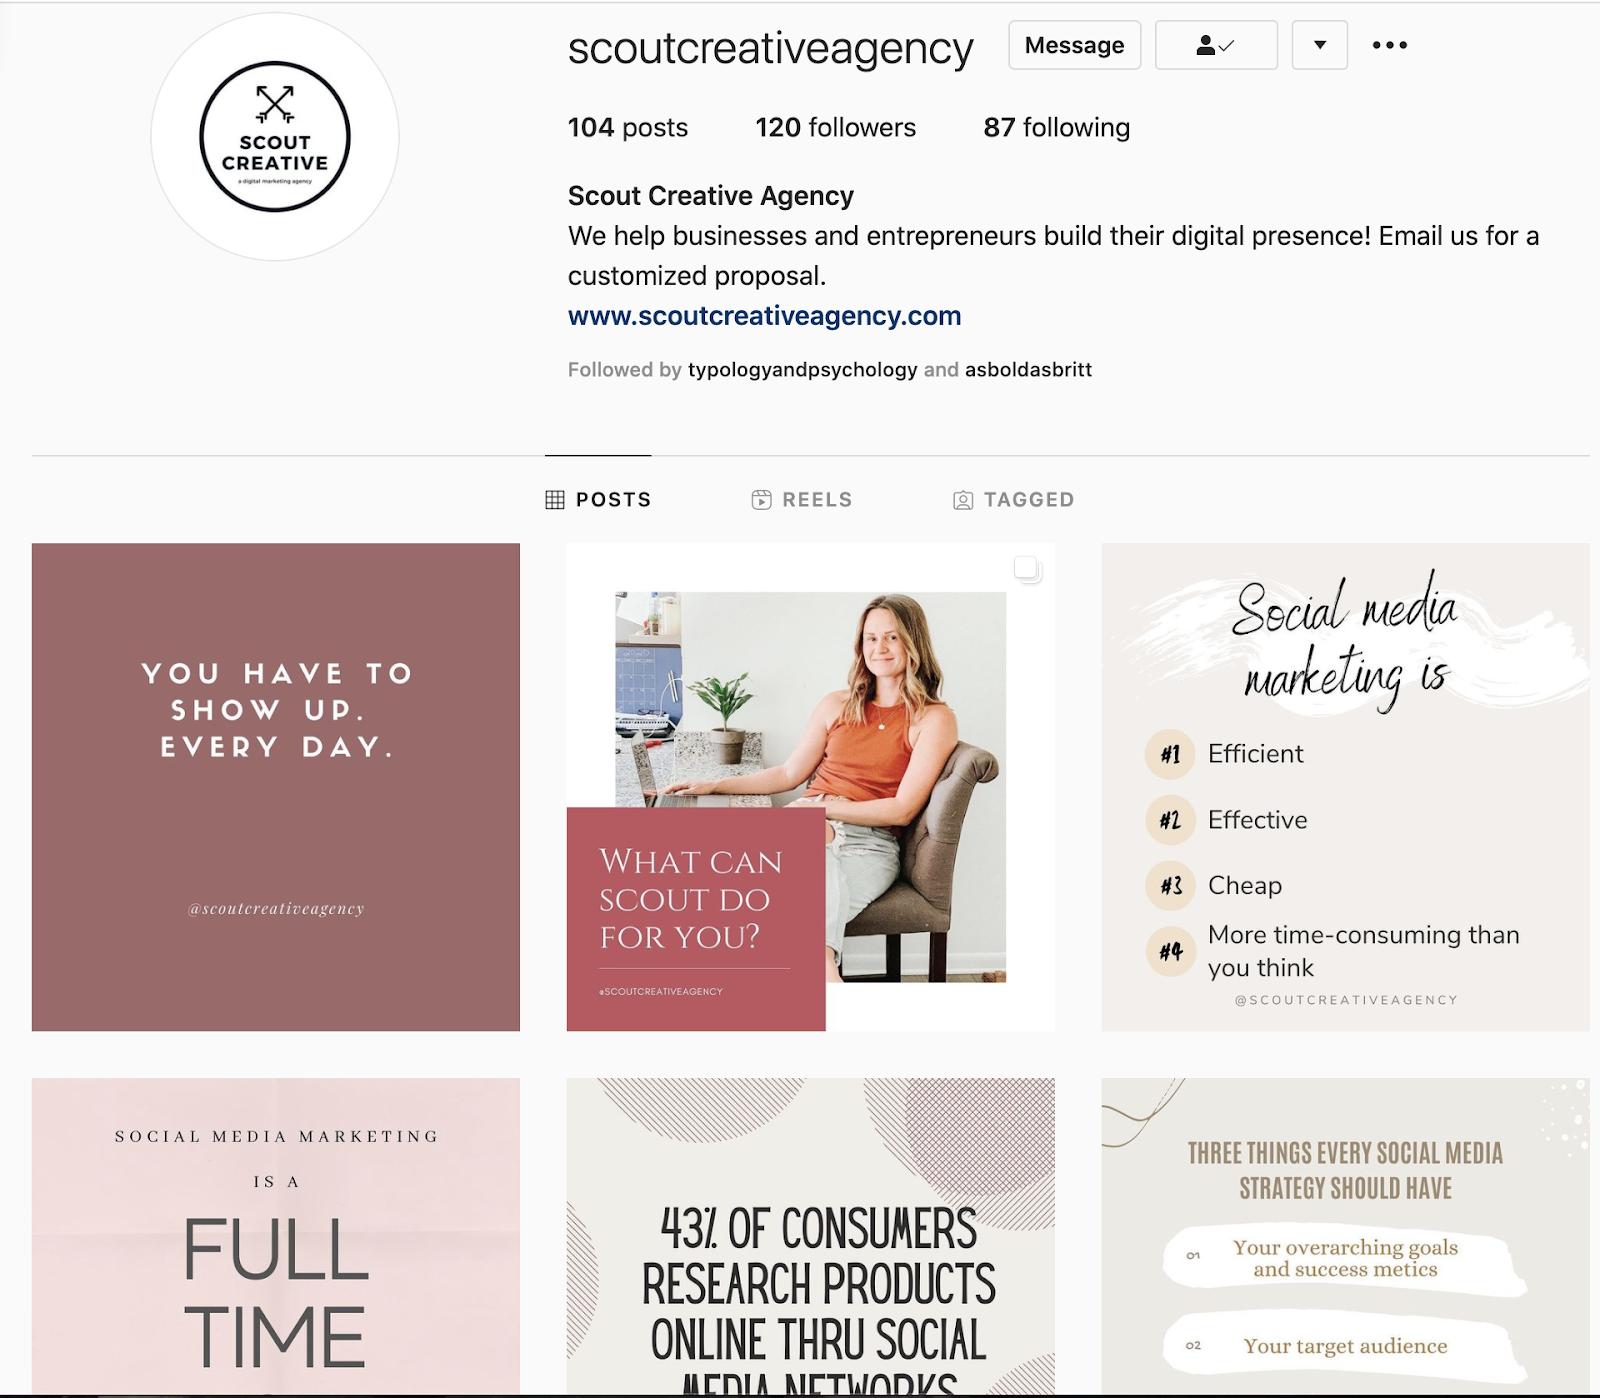 scoutcreativeagency instagram profile